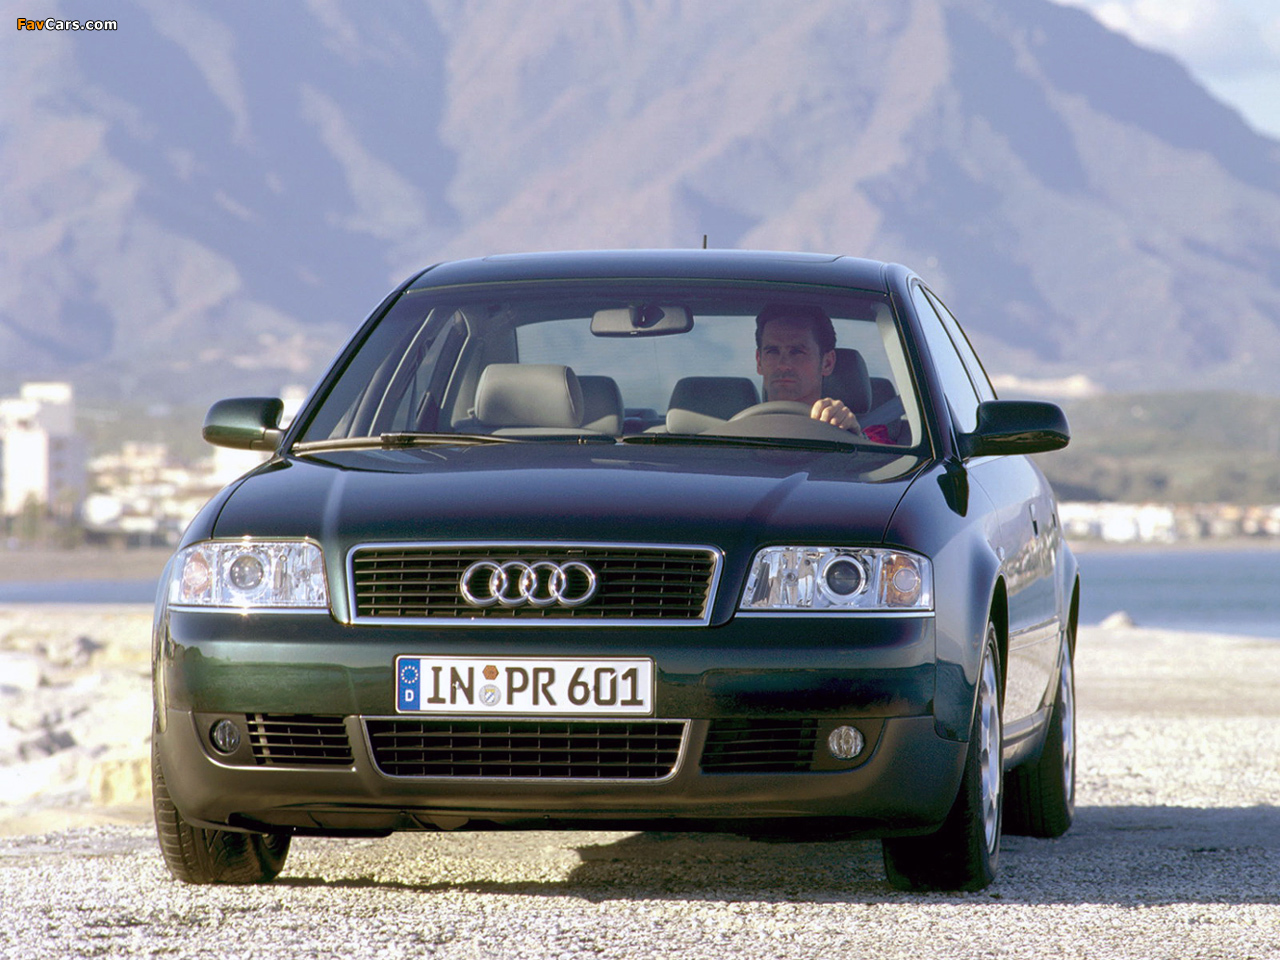 Audi A6 1 9 Tdi Sedan 4b C5 2001 04 Images 1280x960